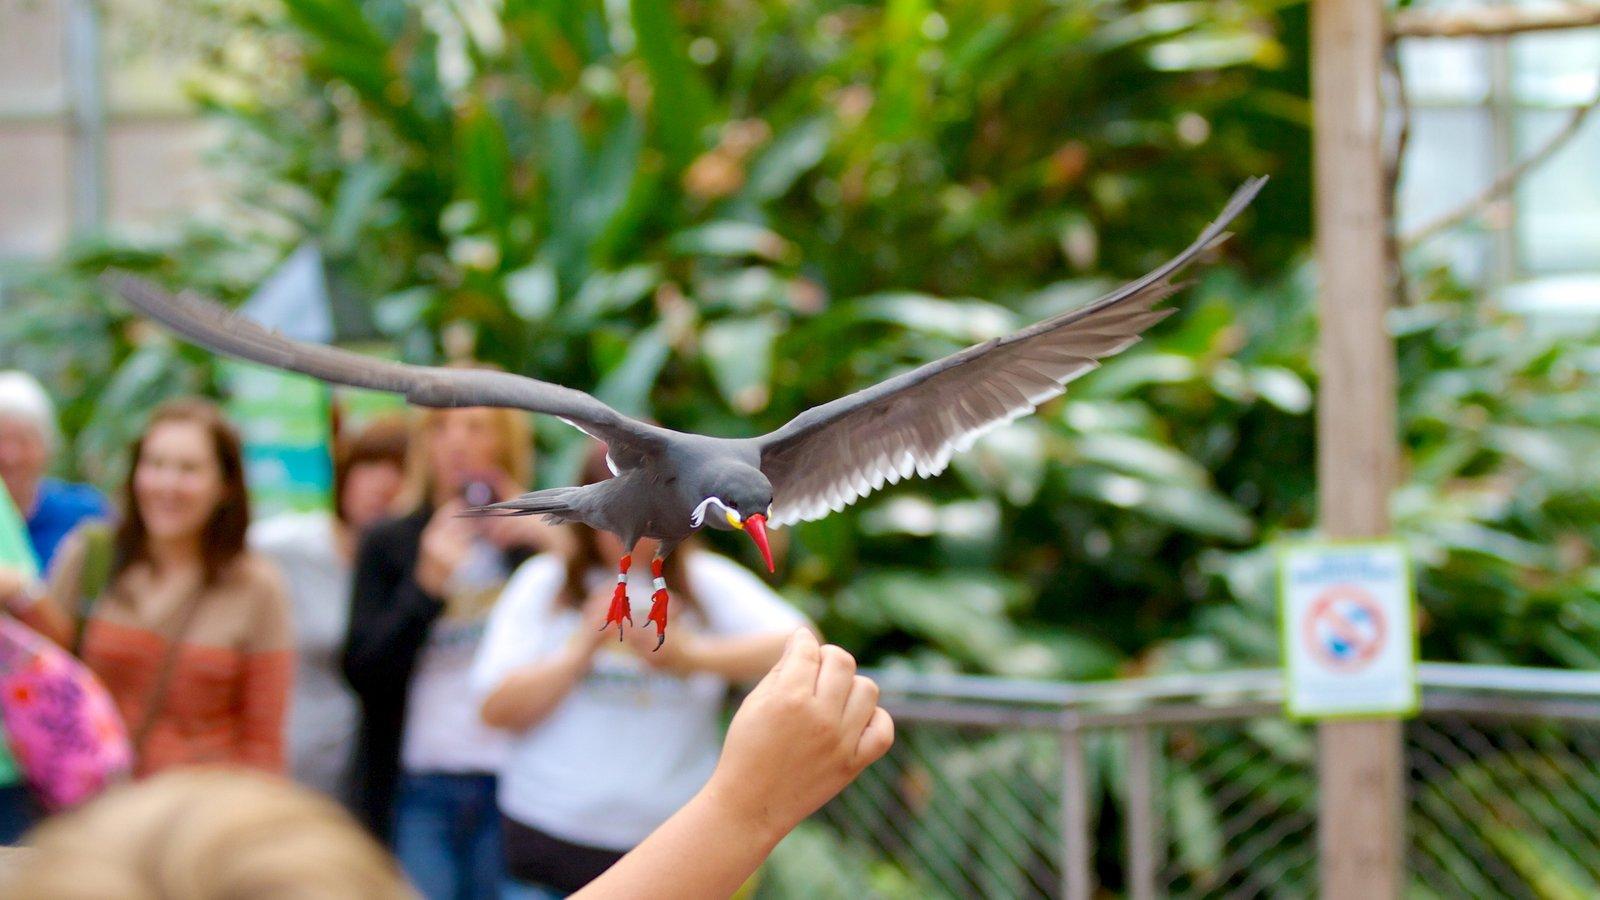 National Aviary caracterizando animais de zoológico e vida das aves